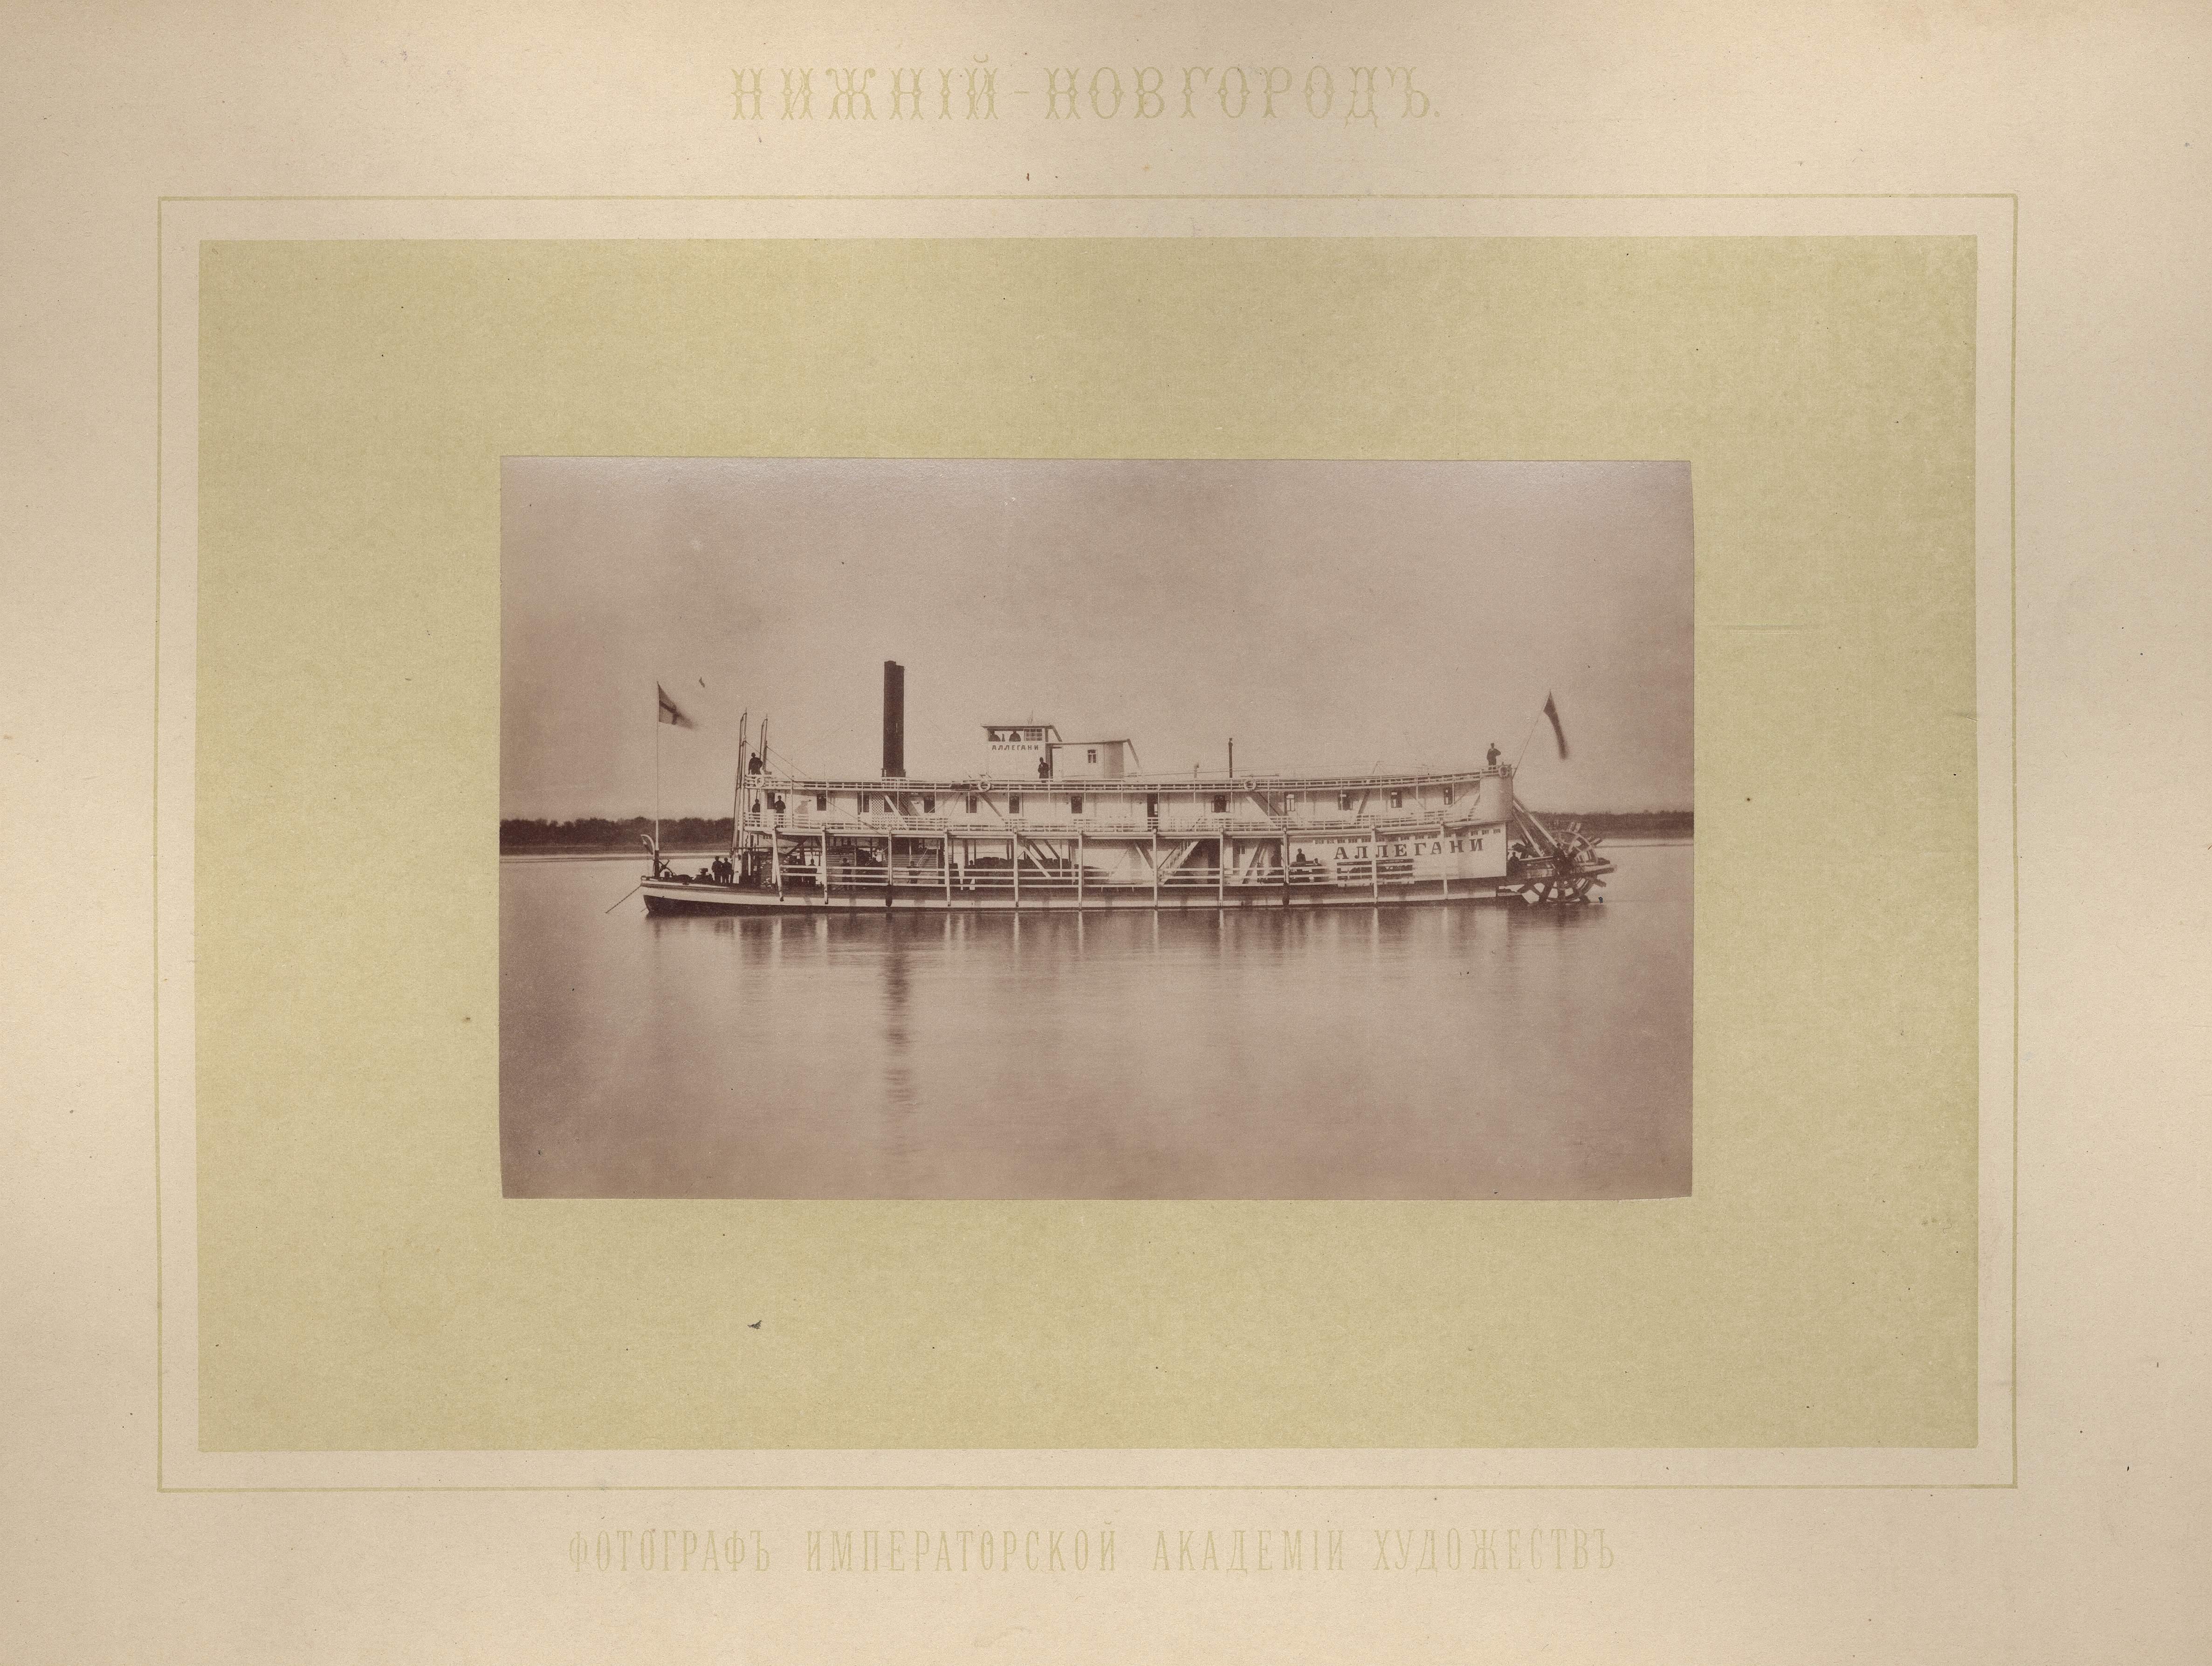 Товаро-пассажирский пароход «Алабама» общества Зевеке